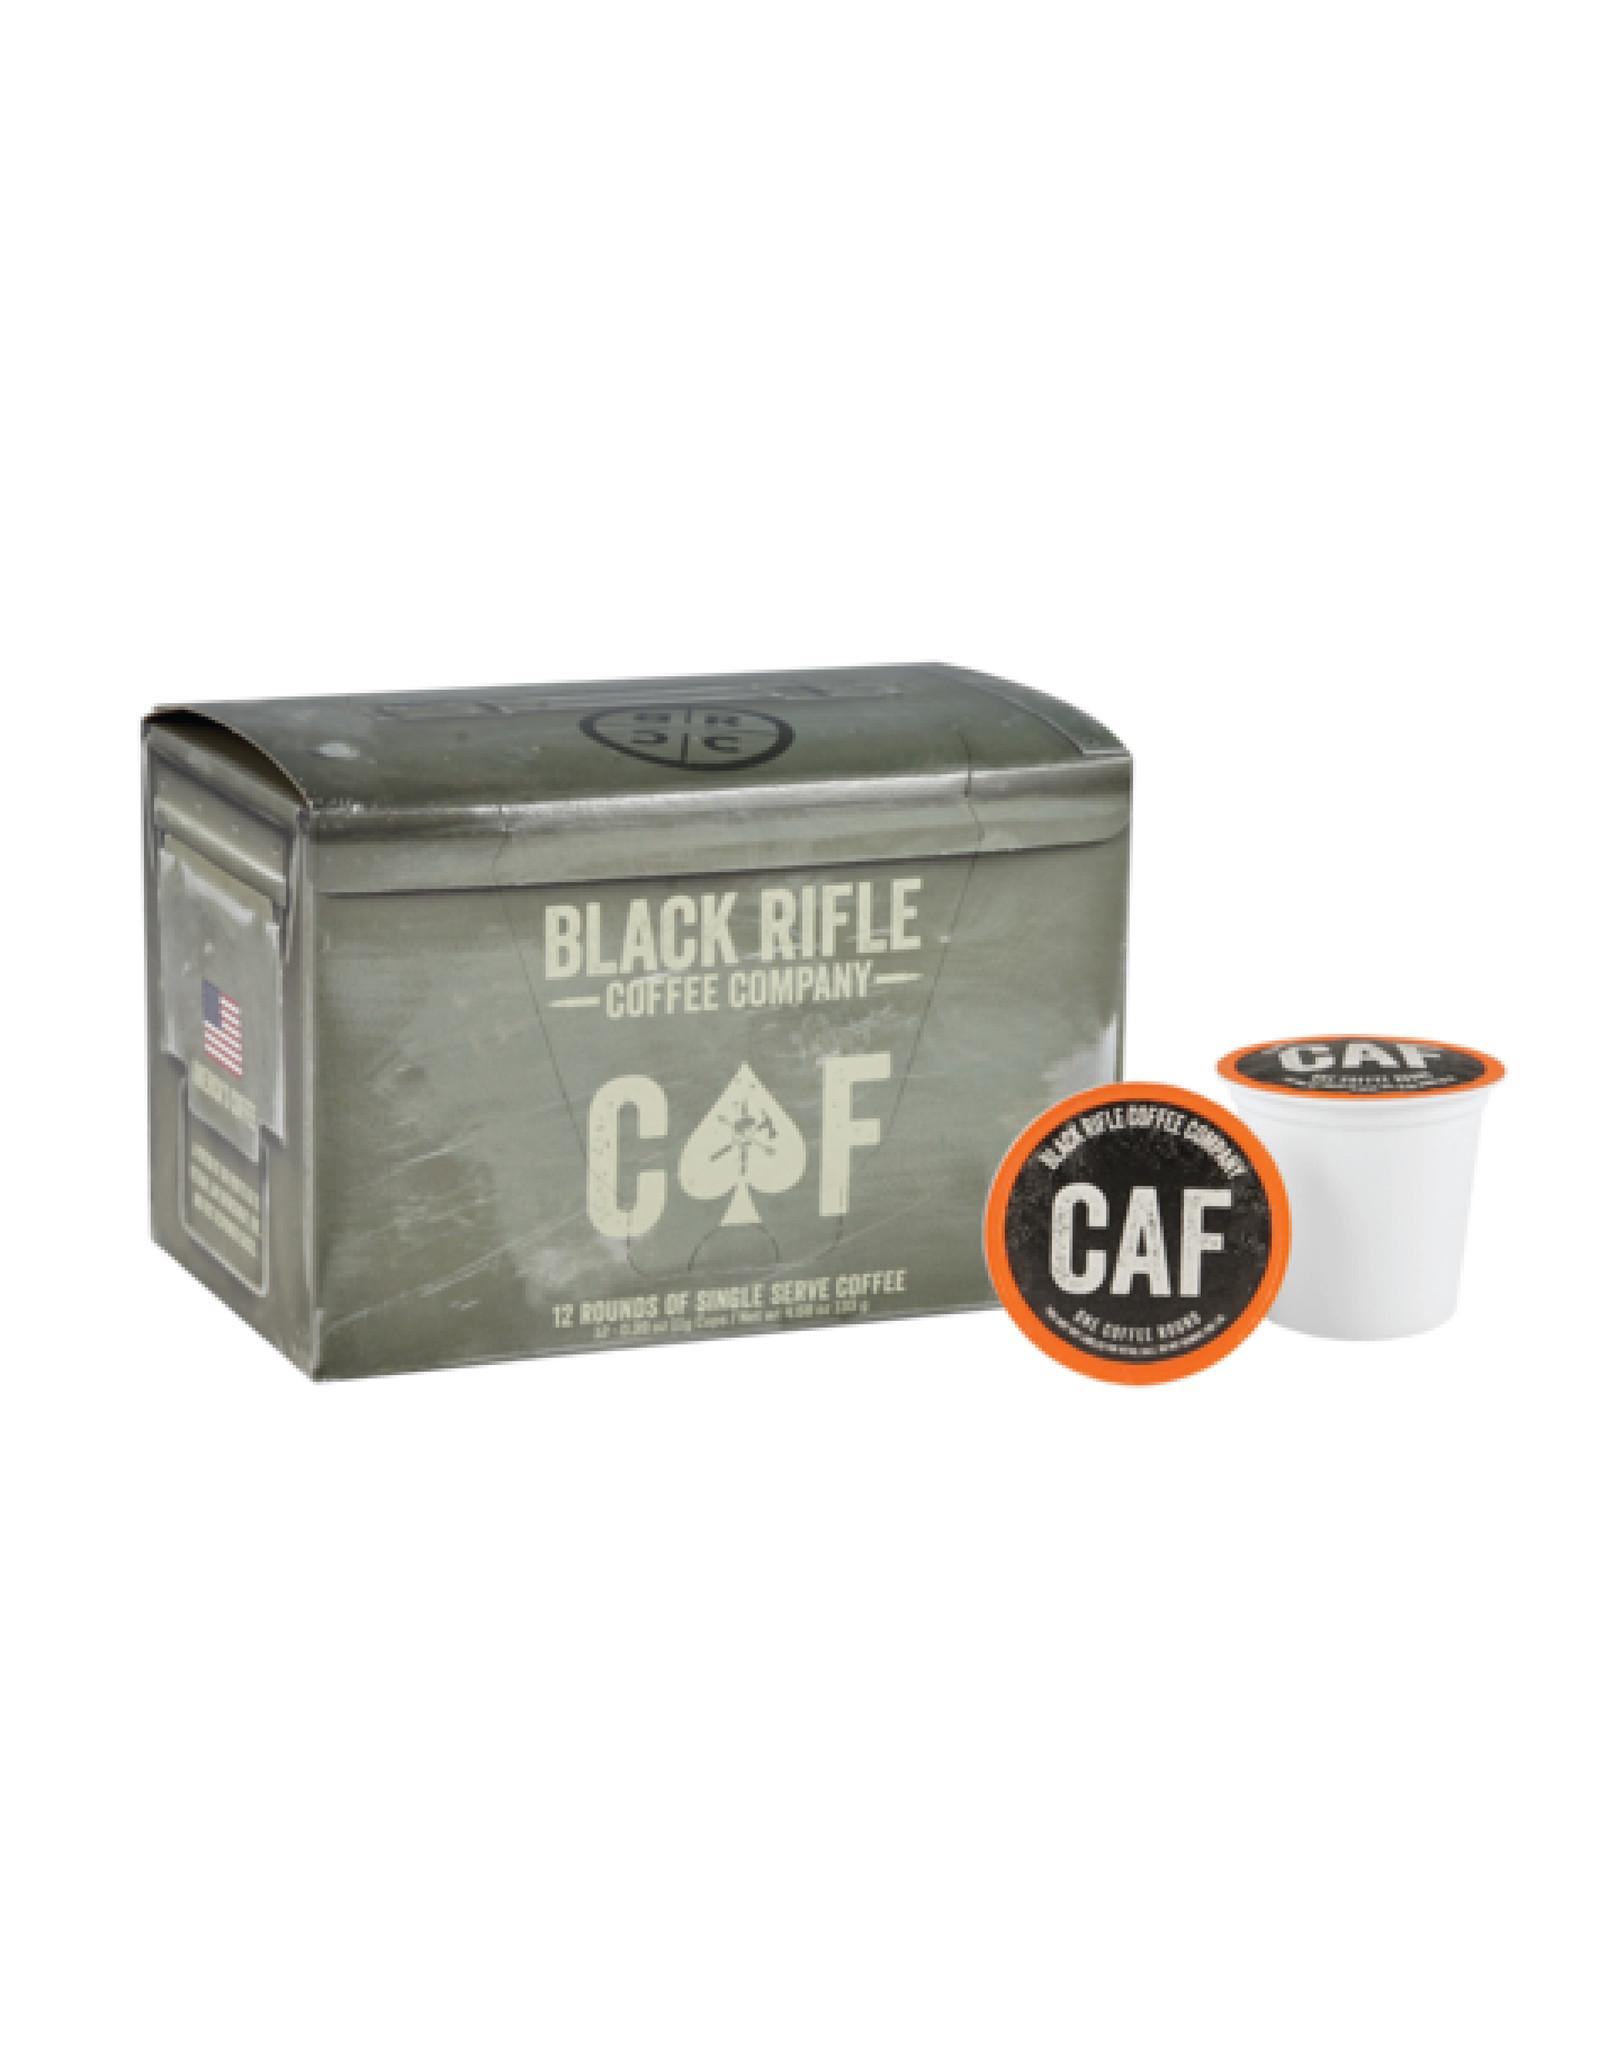 Black Rifle Coffee Company Black Rifle Coffee Company CAF Coffee Rounds 12ct